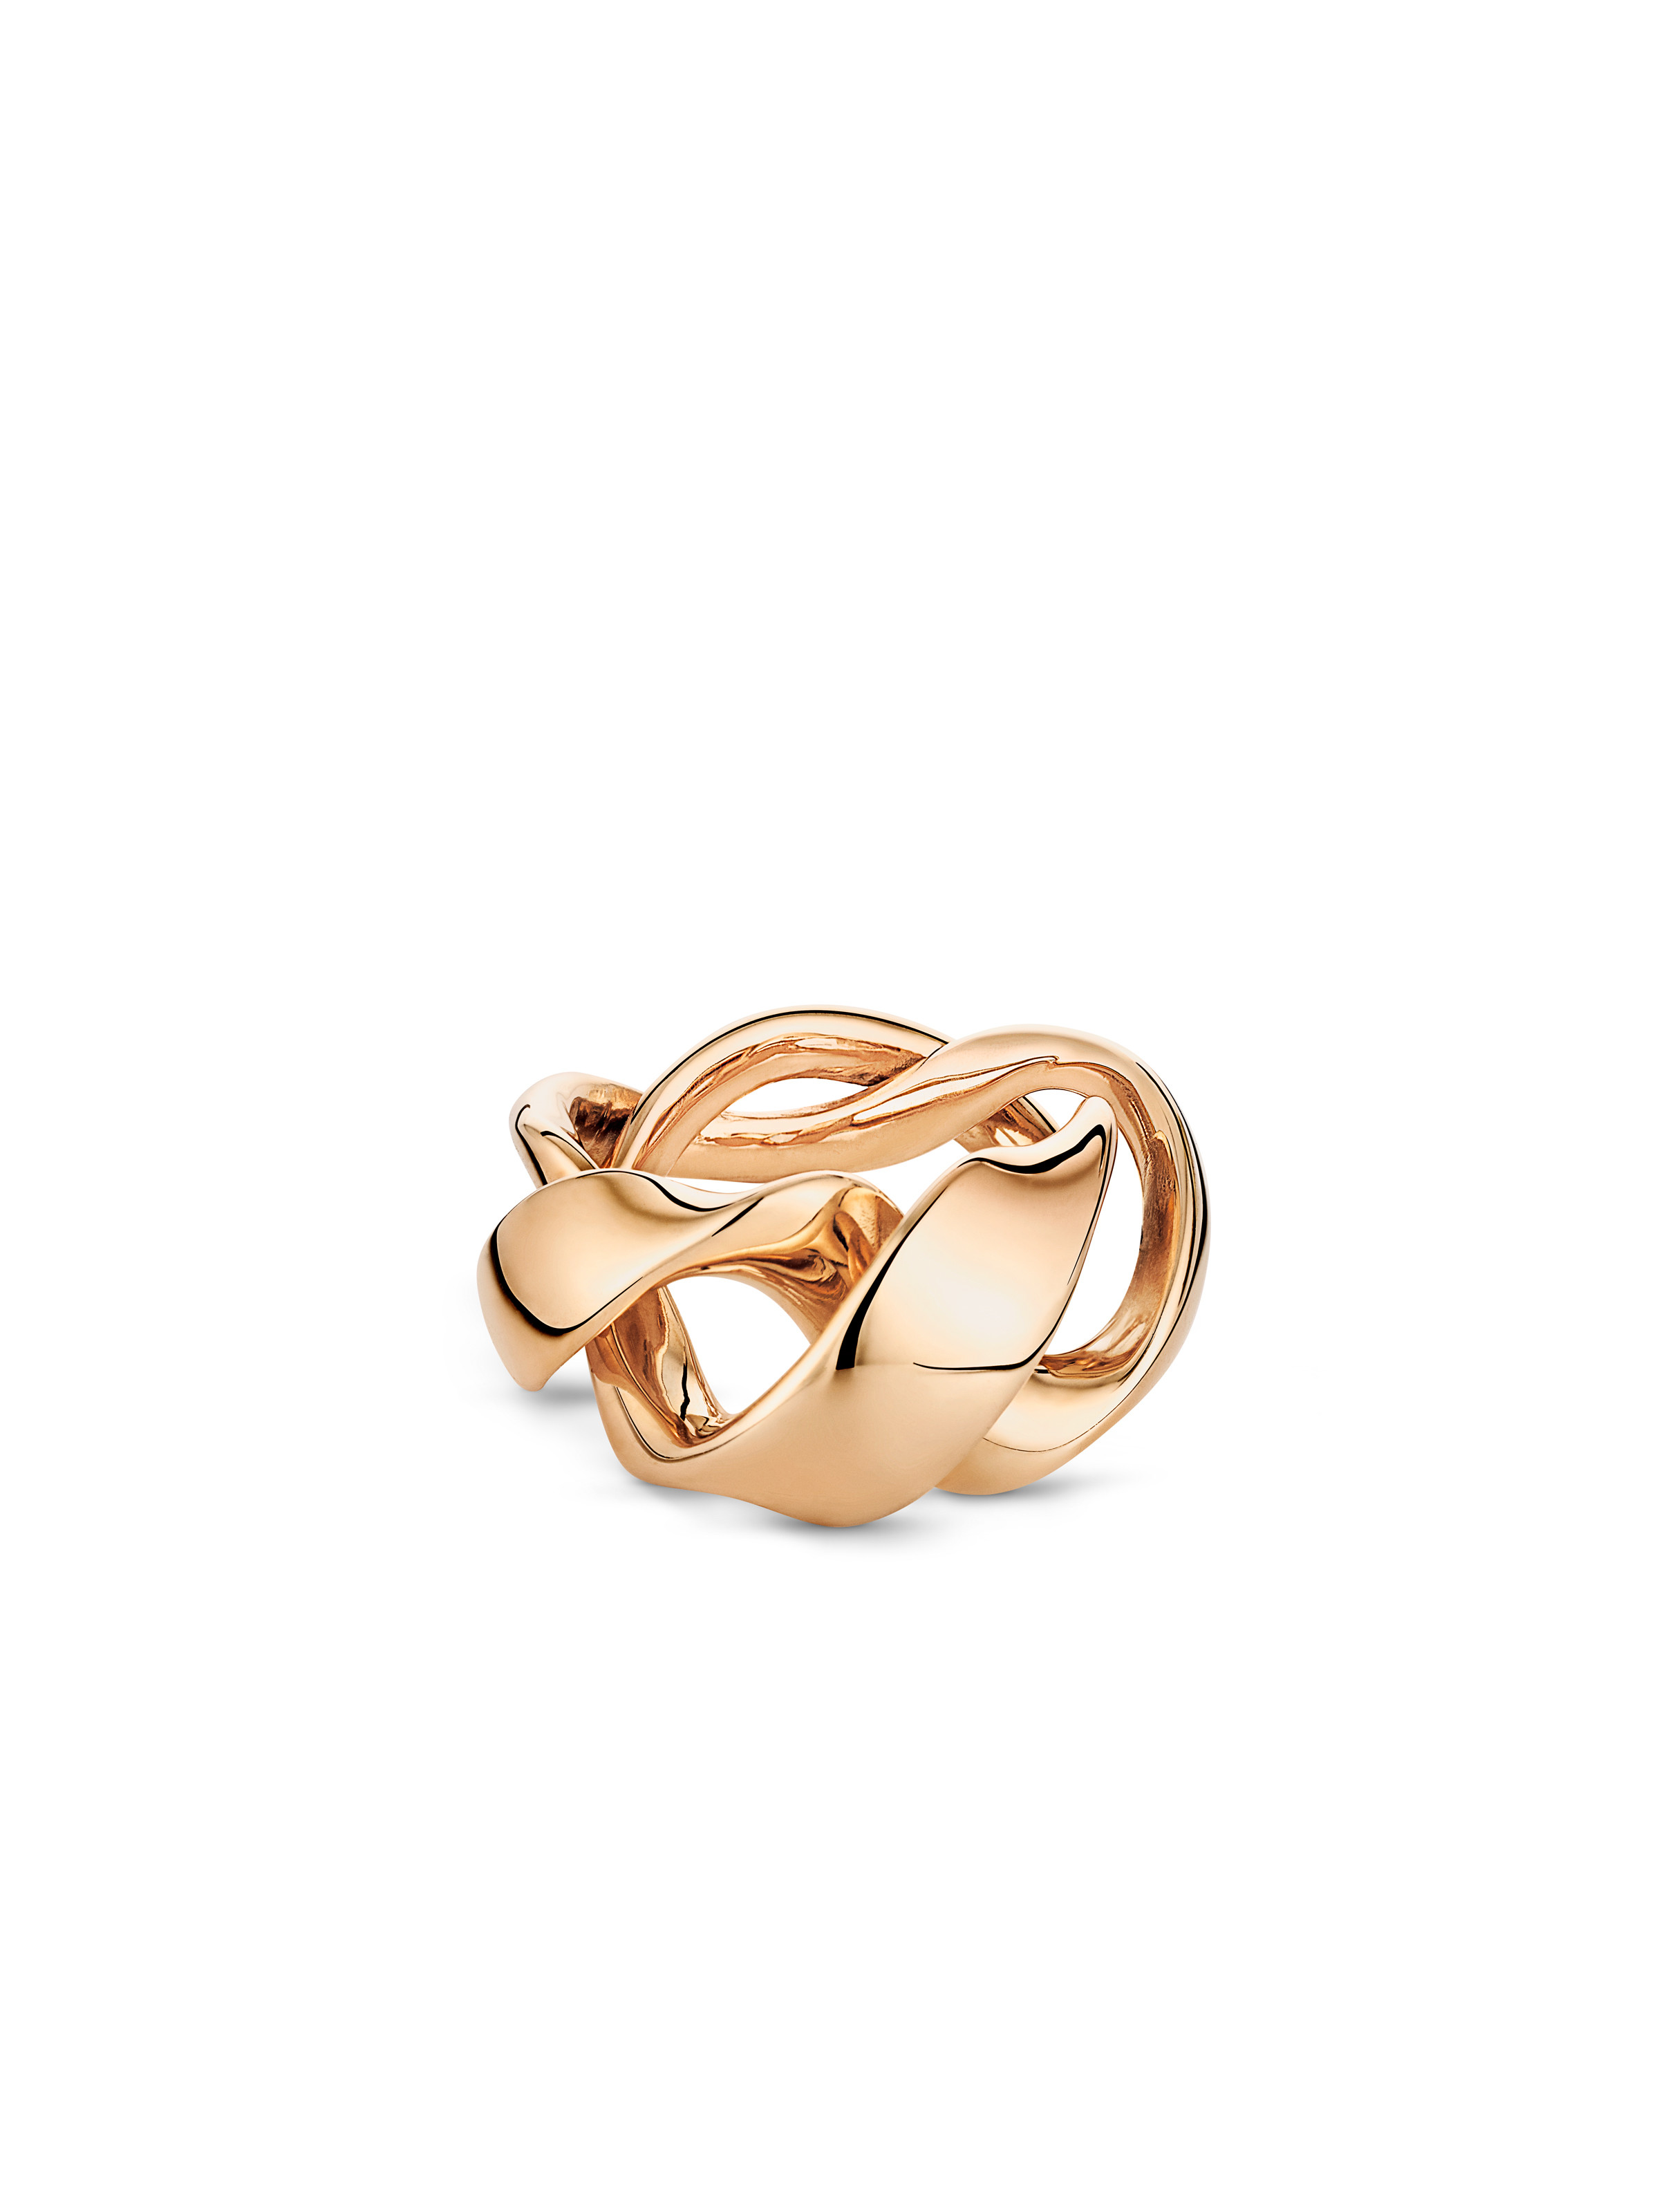 Ring Sensual Golden Bridge